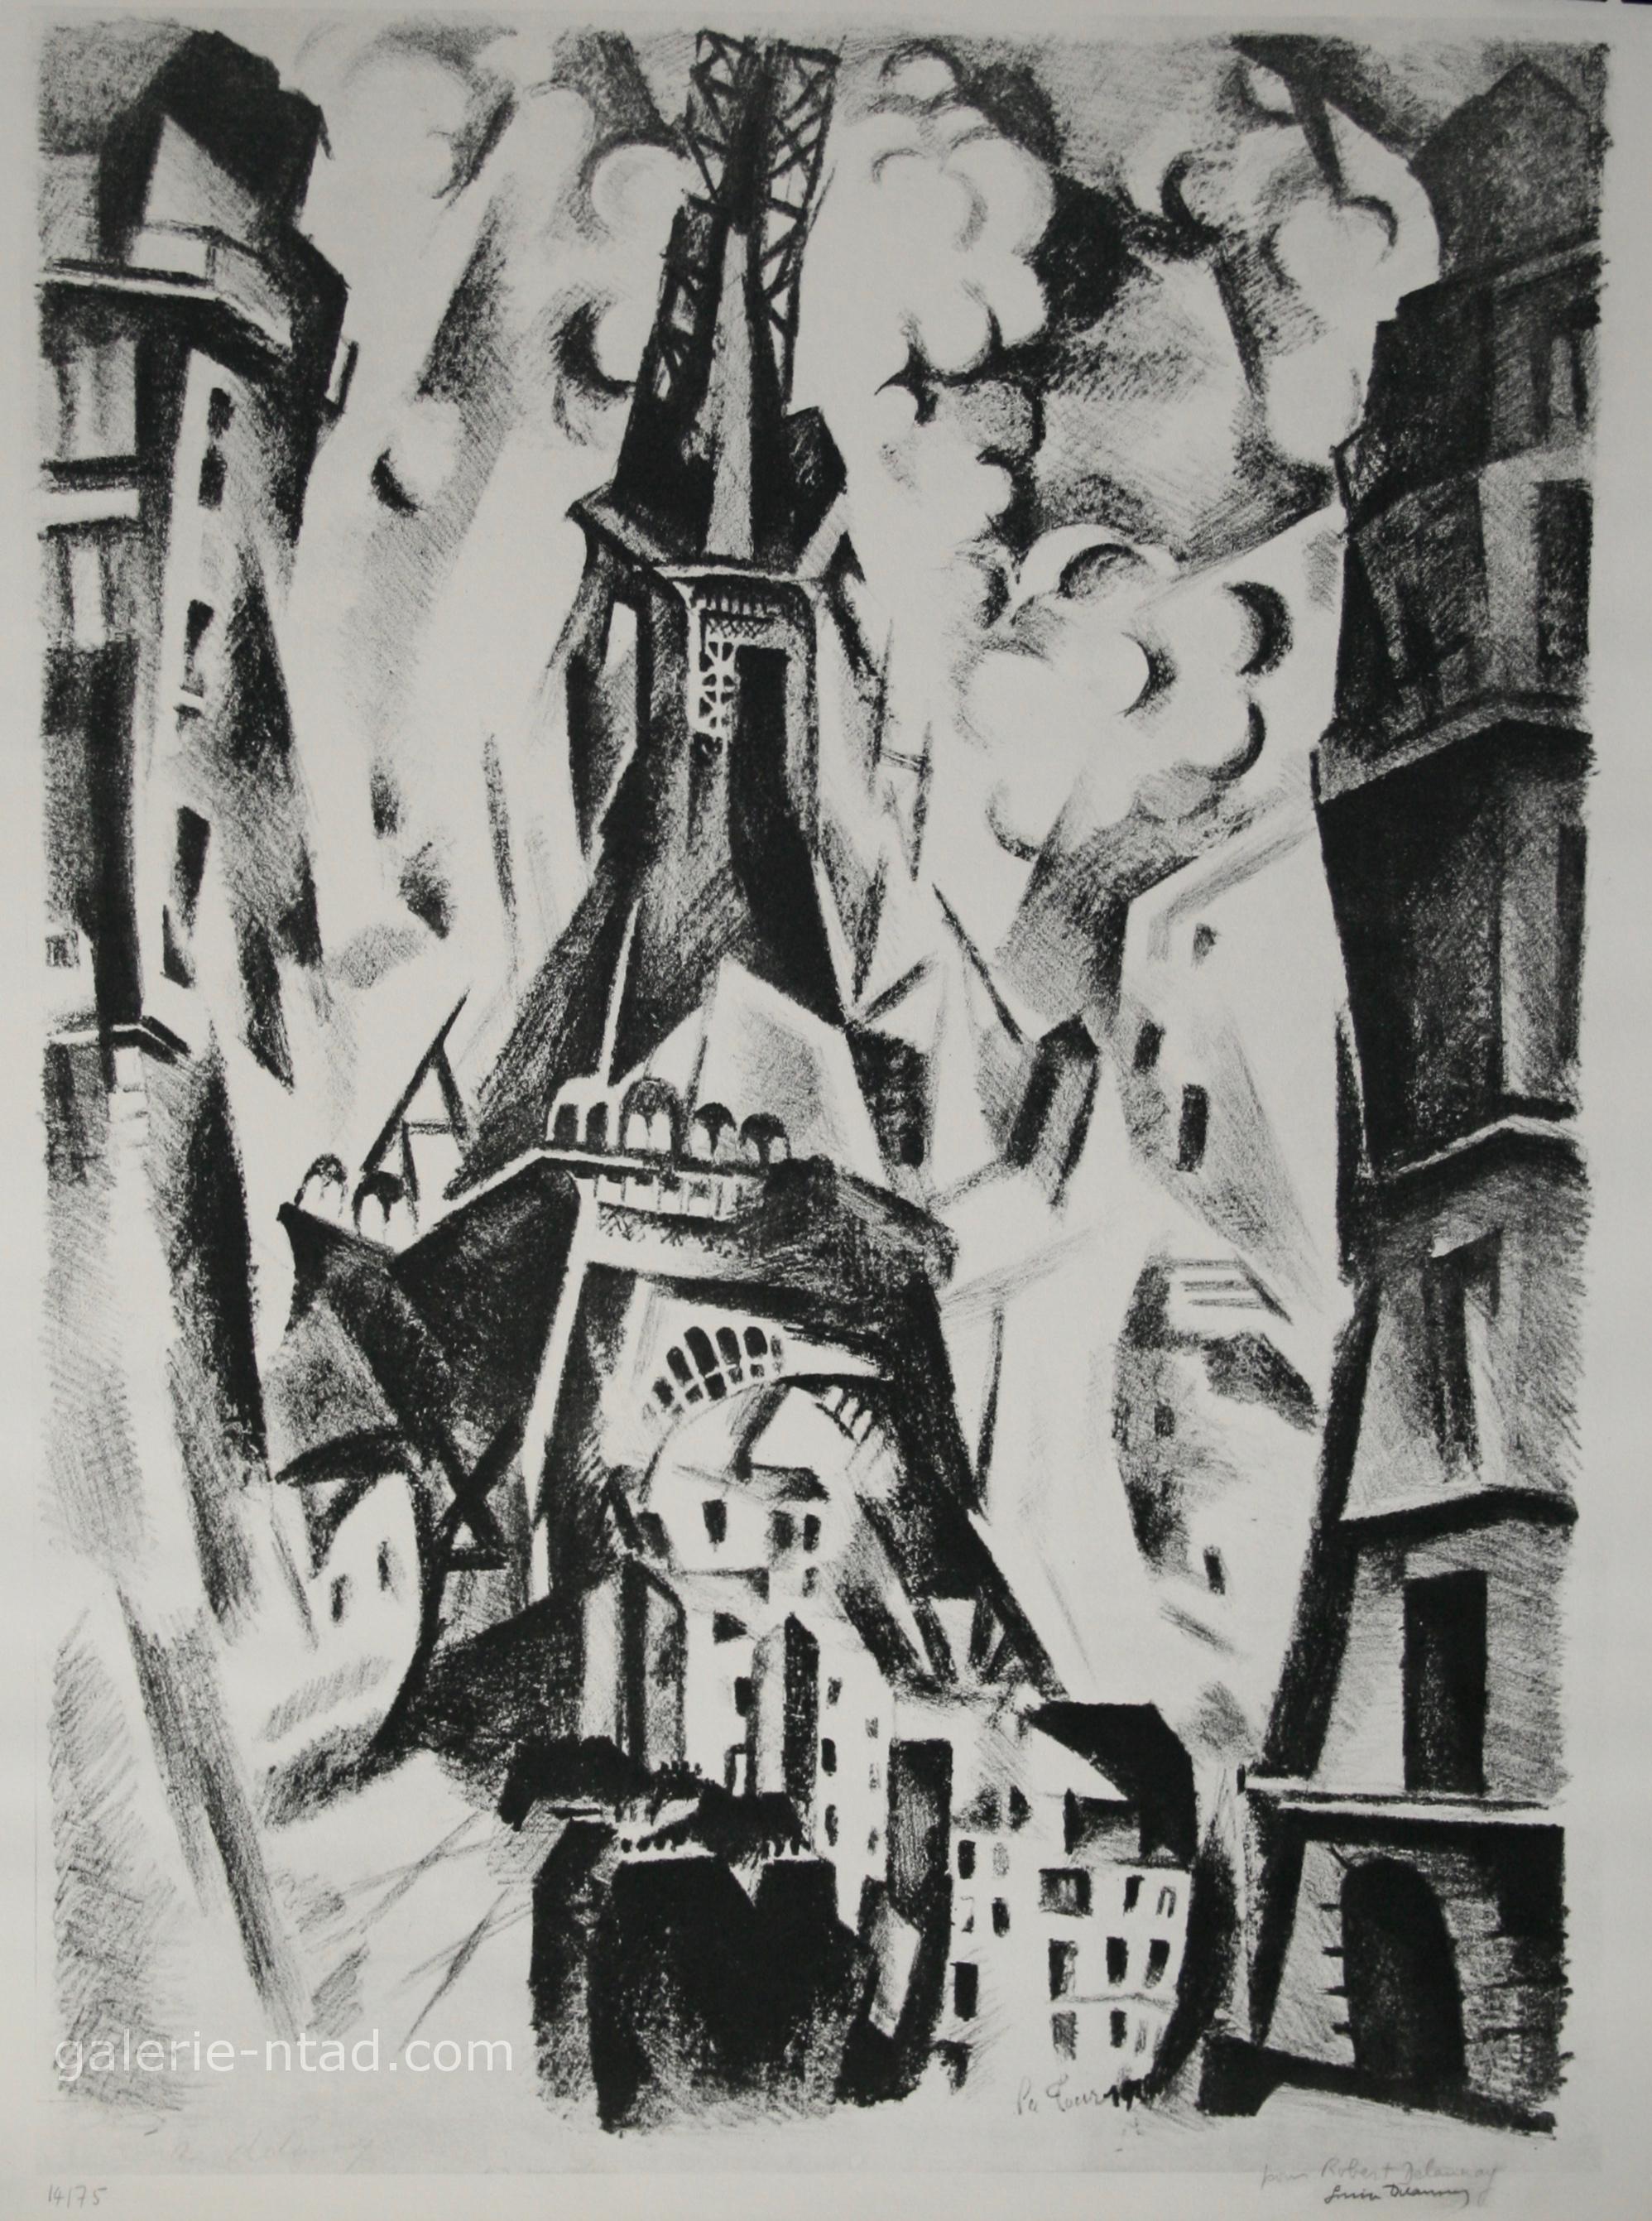 Robert Delaunay D Apres Signee Par Sonia Delaunay Lithographie La Tour Eiffel Galerie Ntad